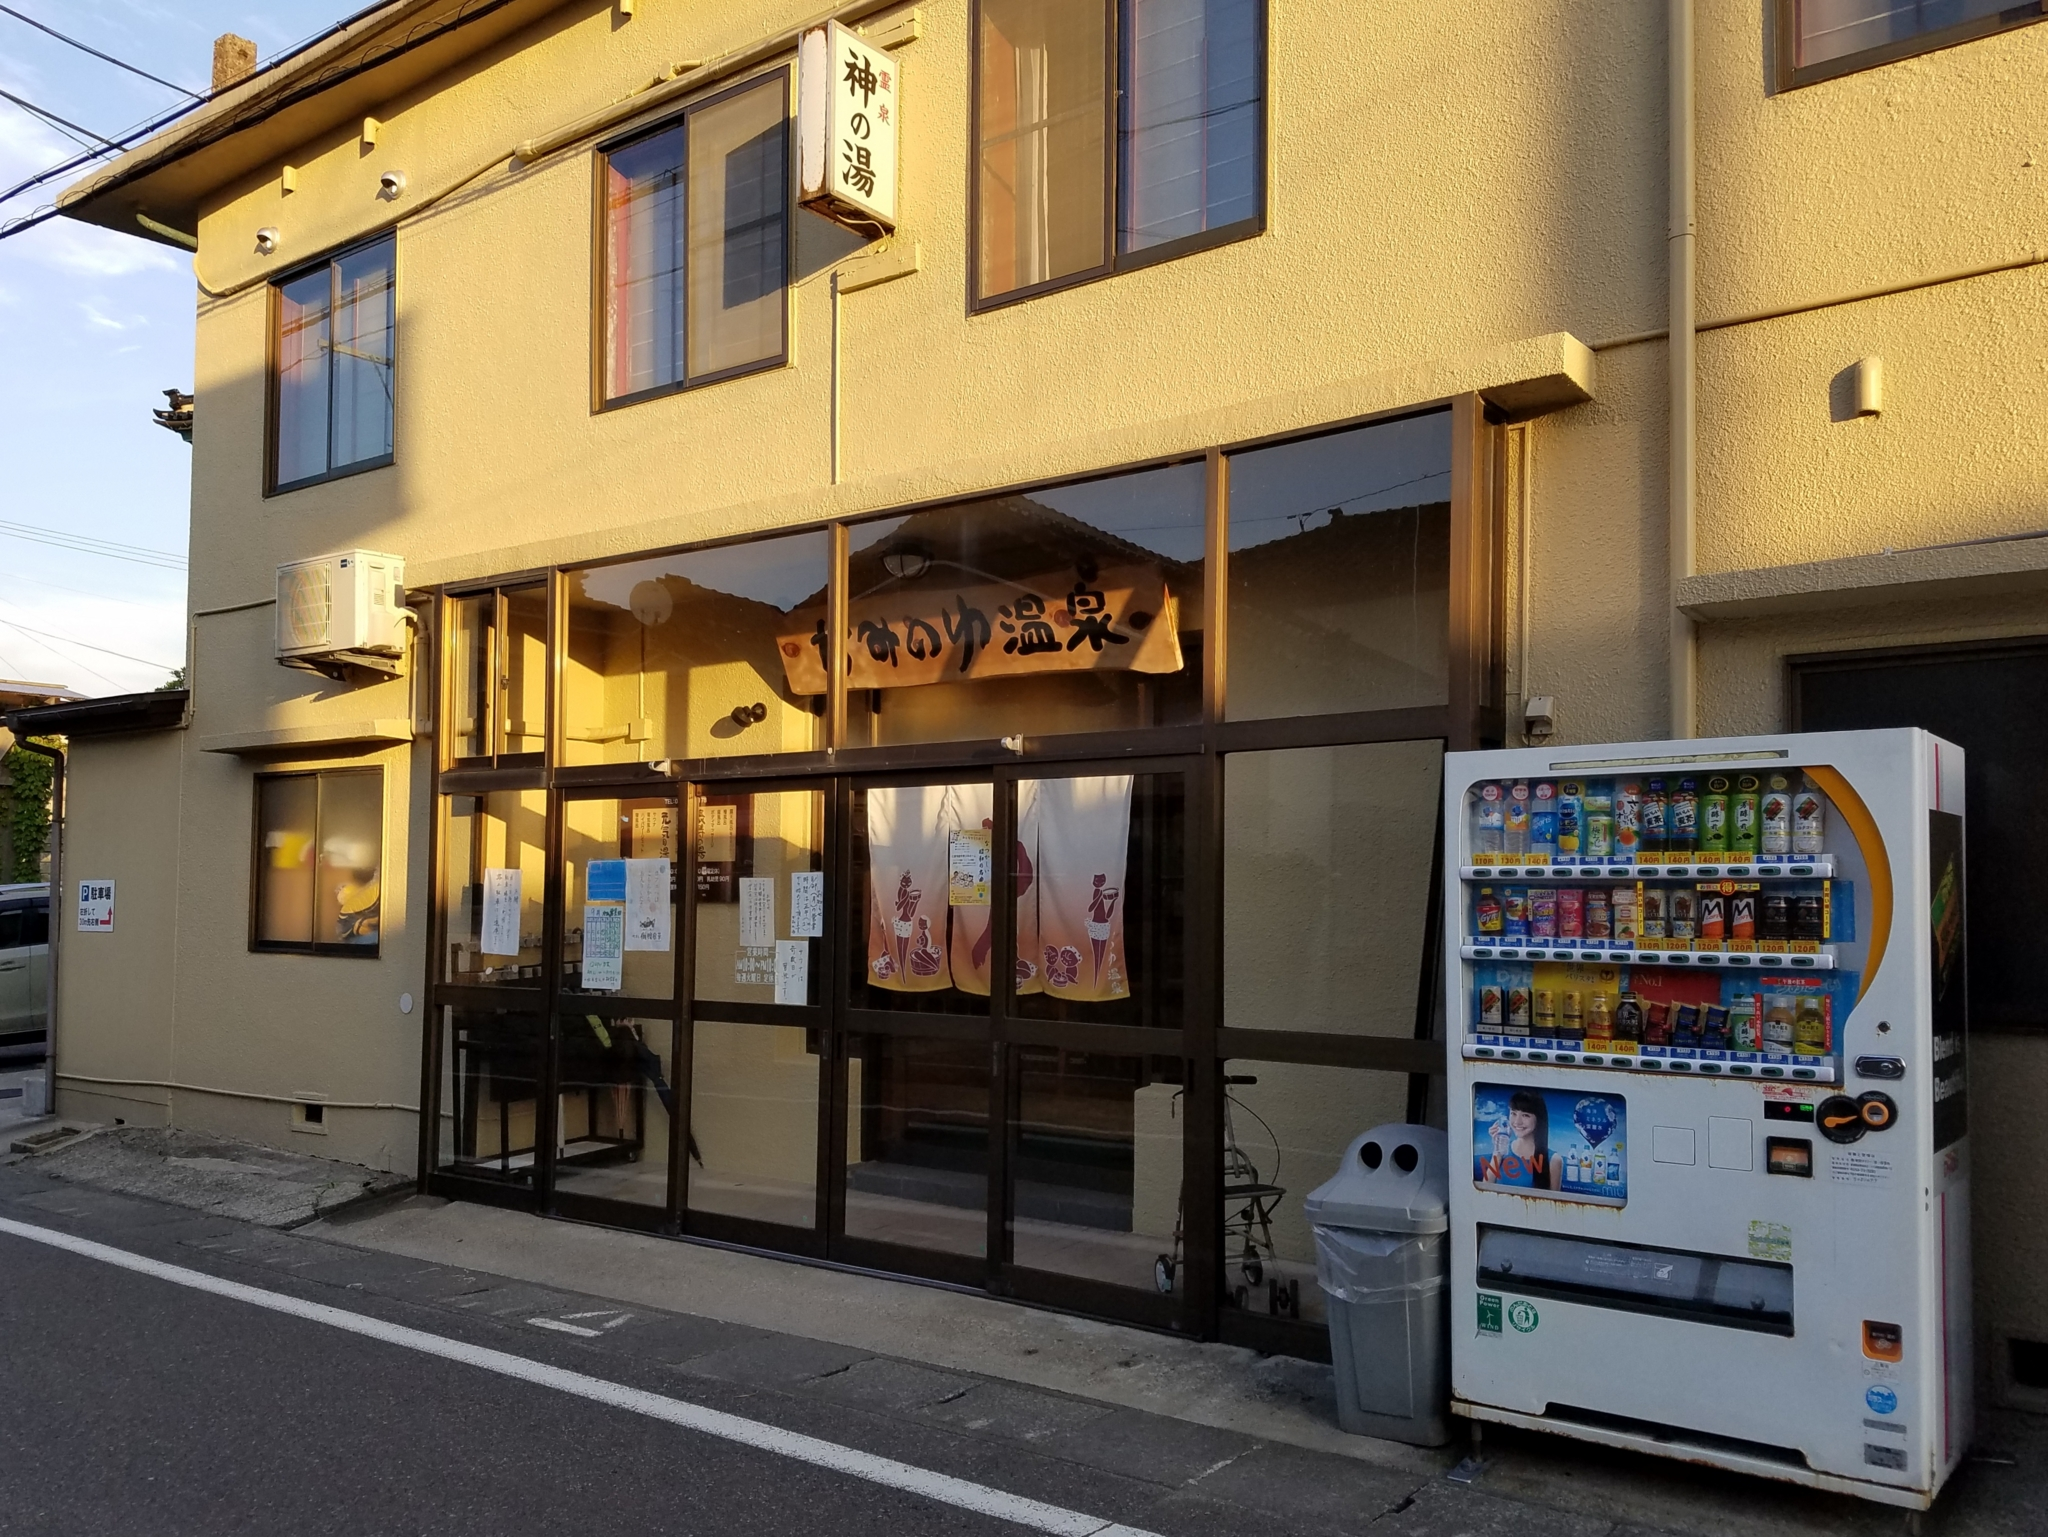 f:id:ToshUeno:20160902172421j:plain